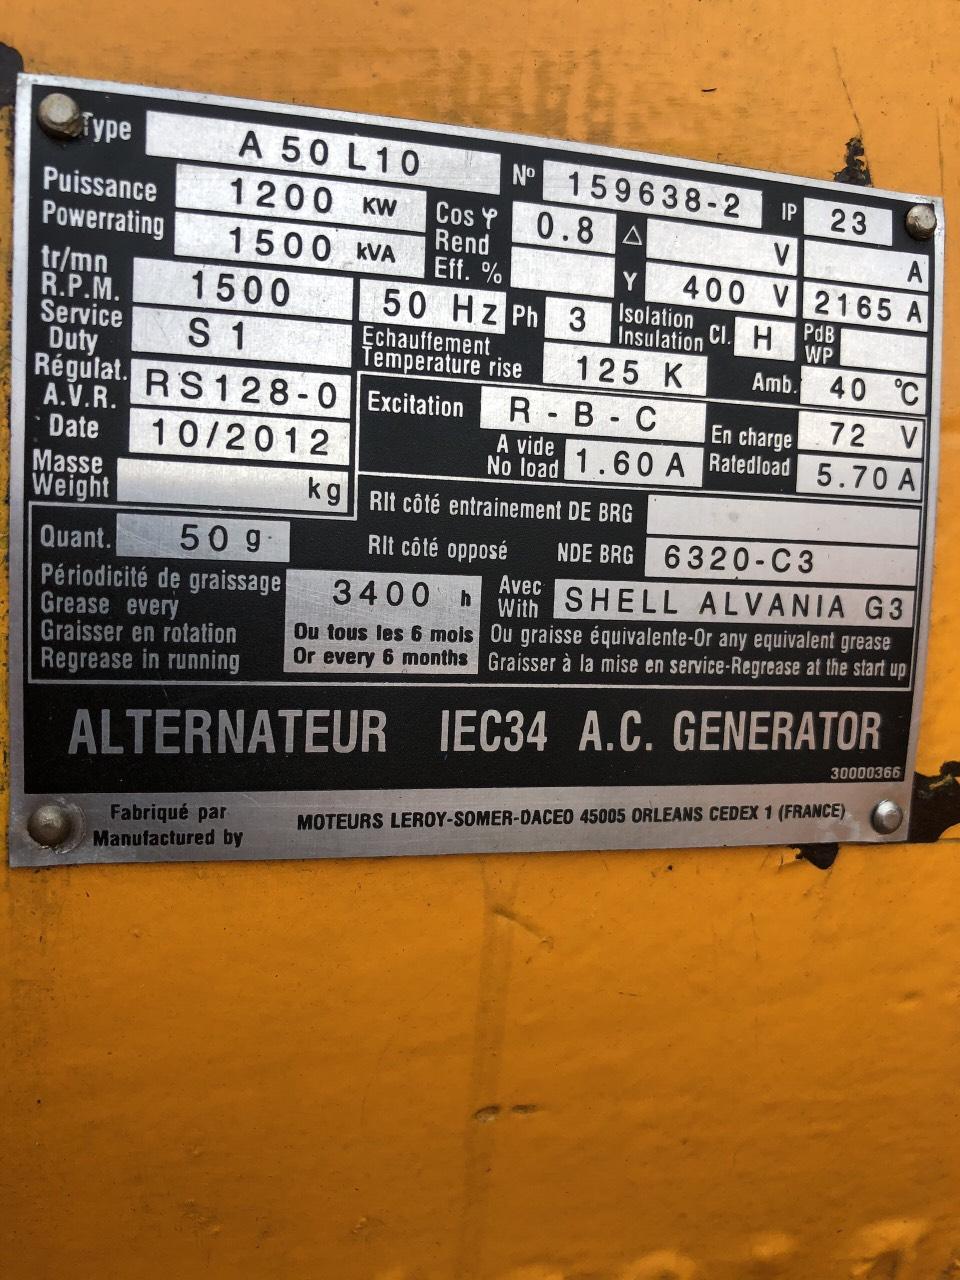 Máy phát điện cũ Cummins 1500 Kva